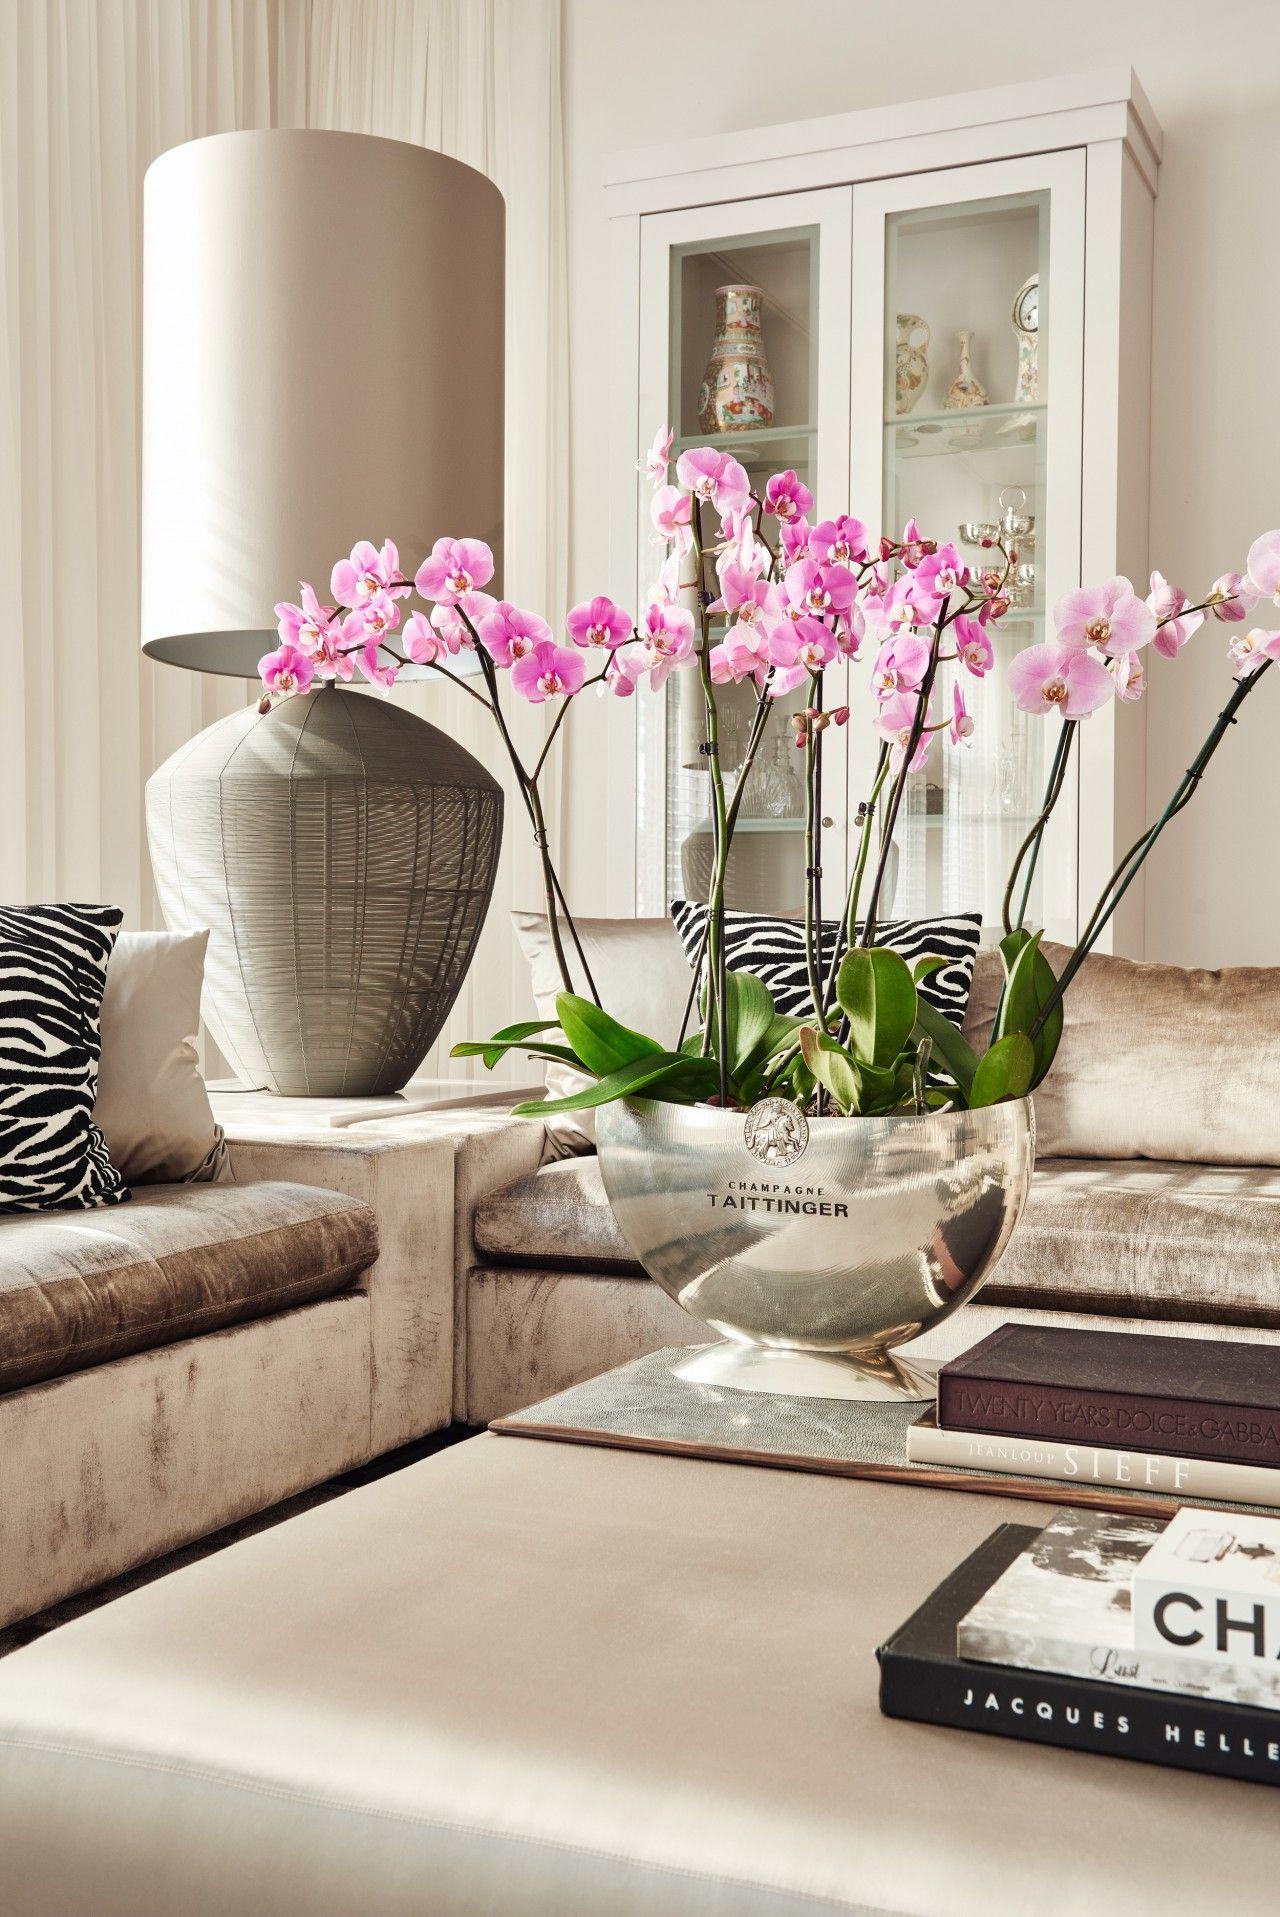 The Netherlands / Amsterdam / Private Residence / Living Room / Eric Kuster / Metropolitan Luxury